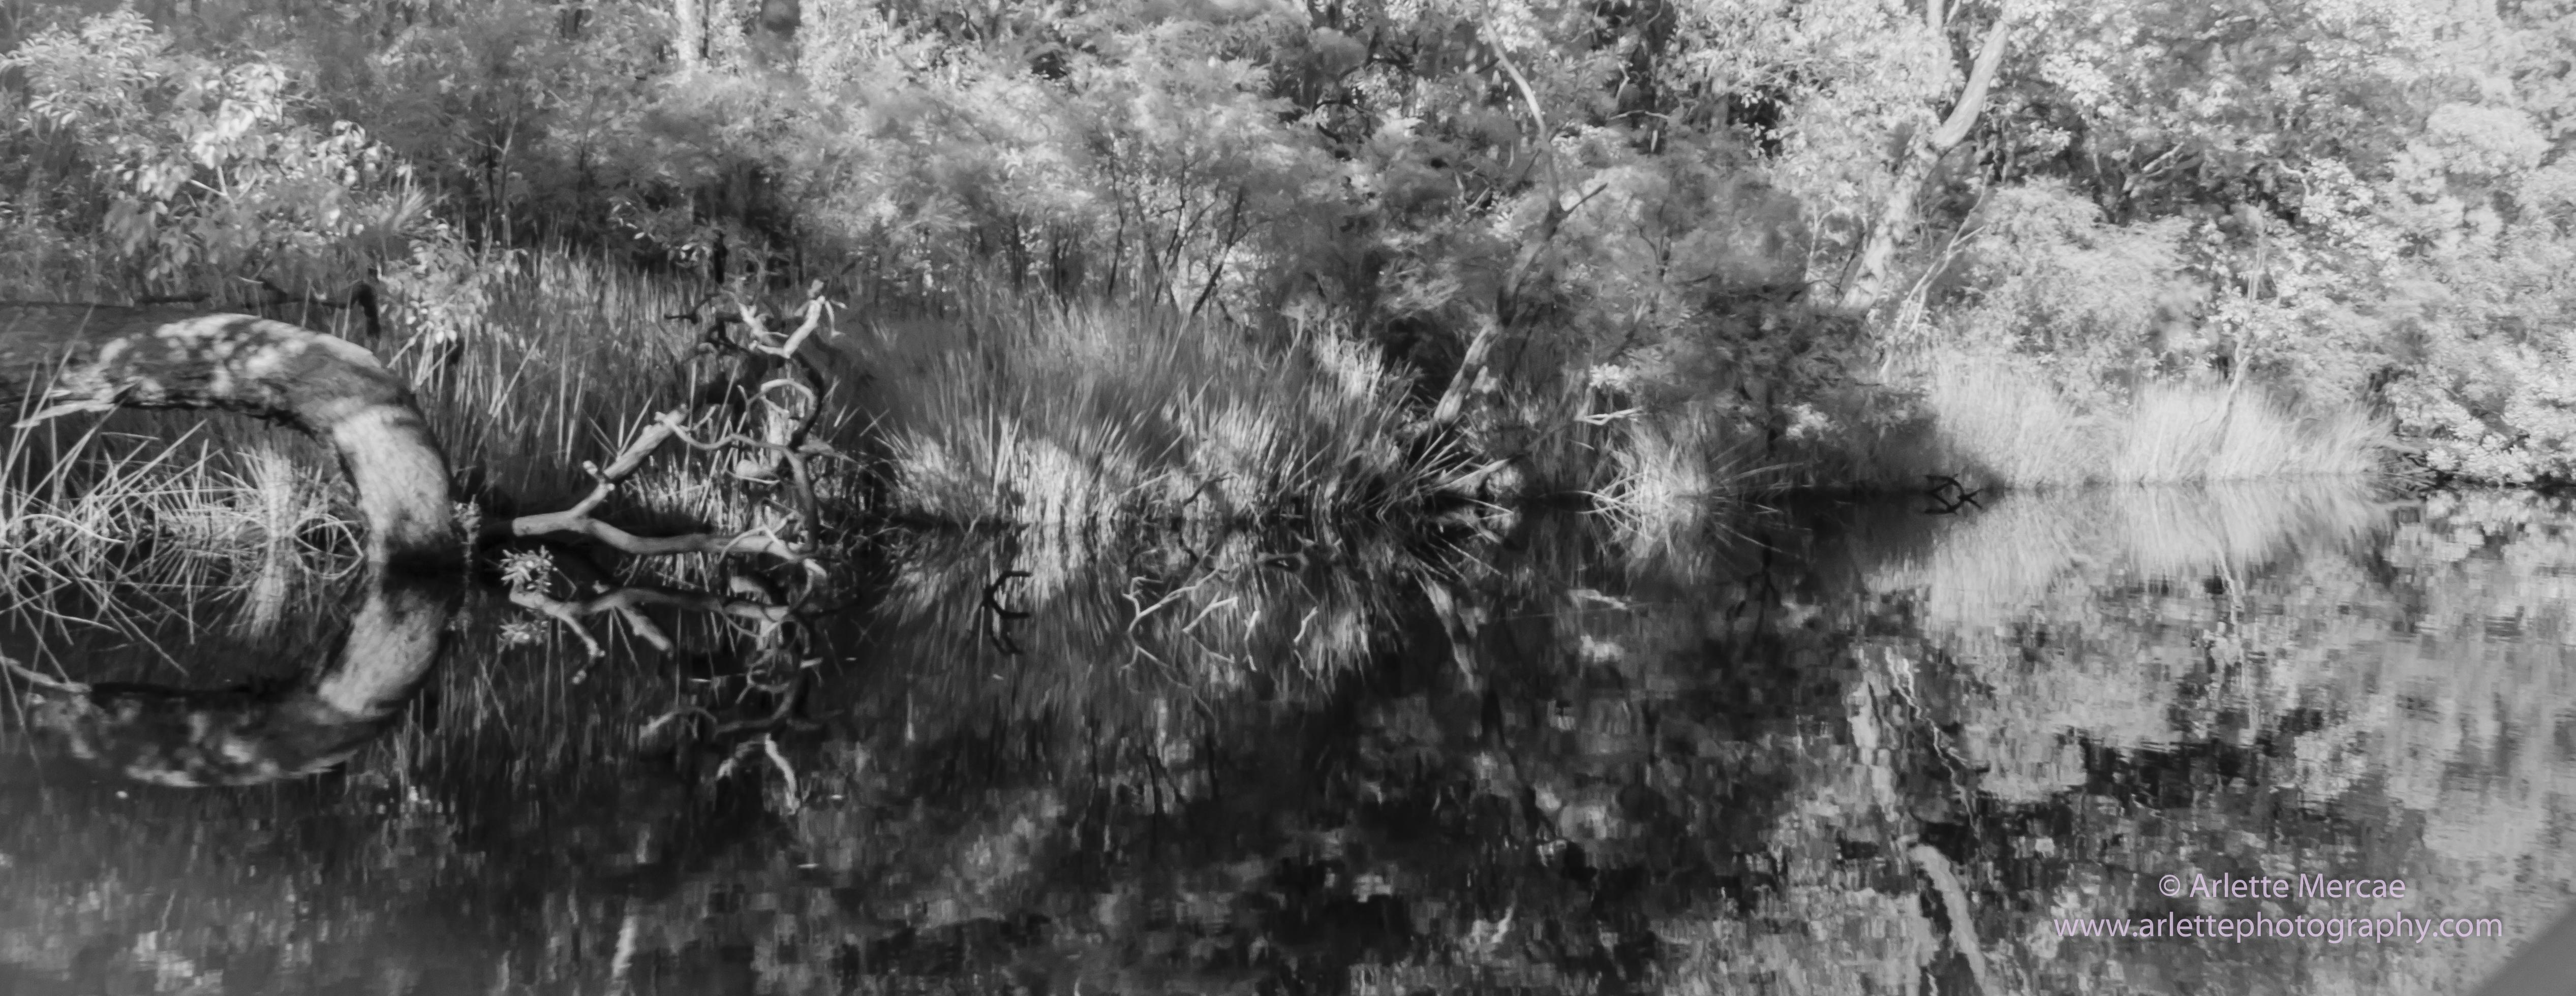 Noosa Everglades - 17